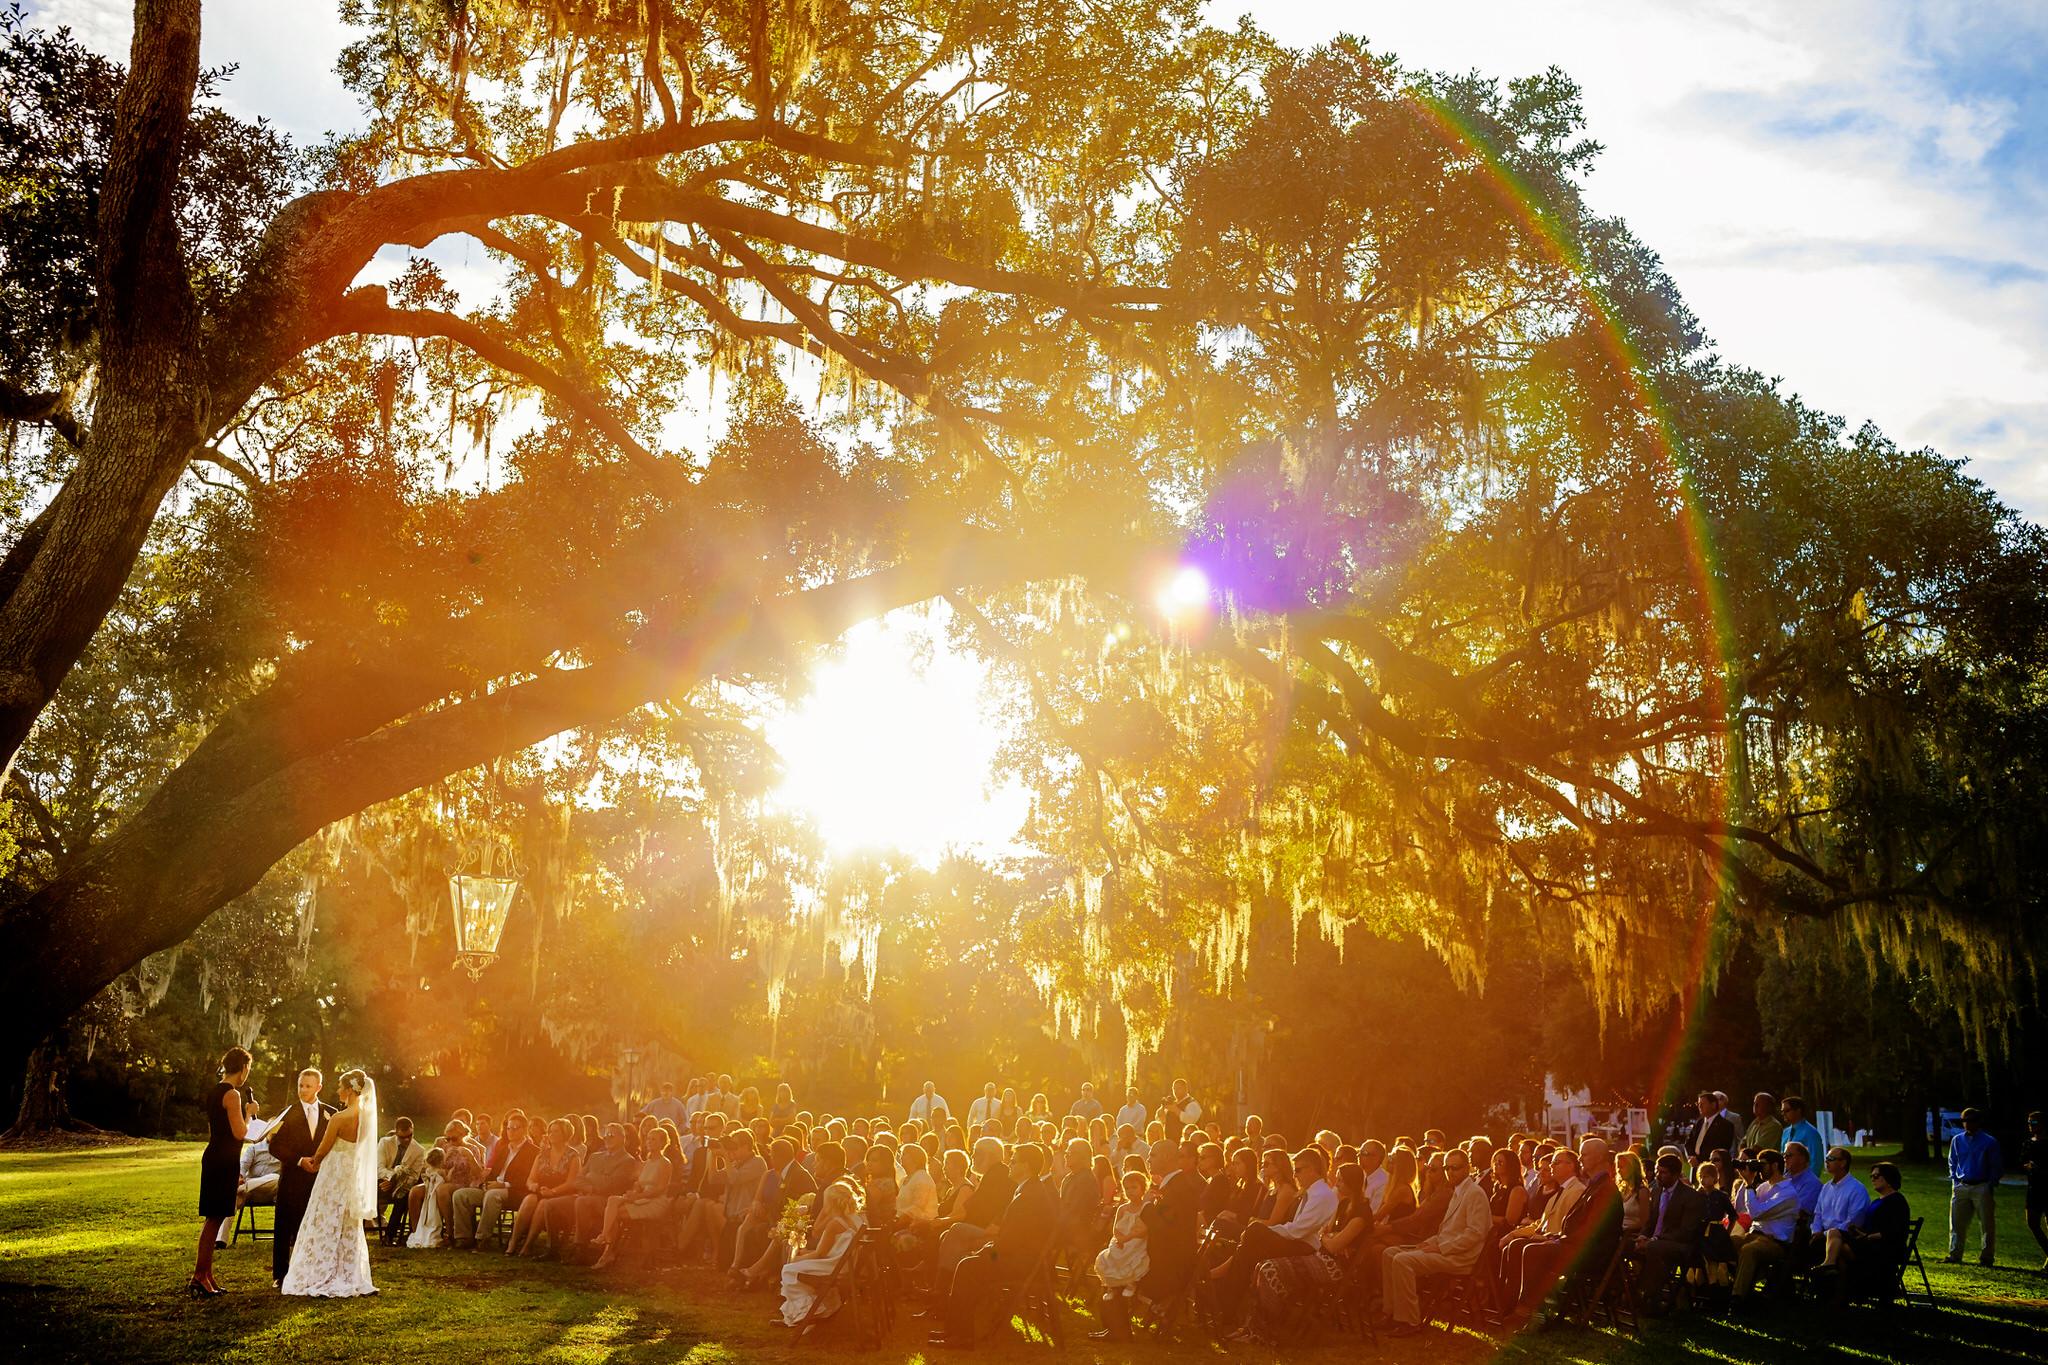 Cori and Kyle's wedding at Old Wide Awake Park in Hollywood, South Carolina.